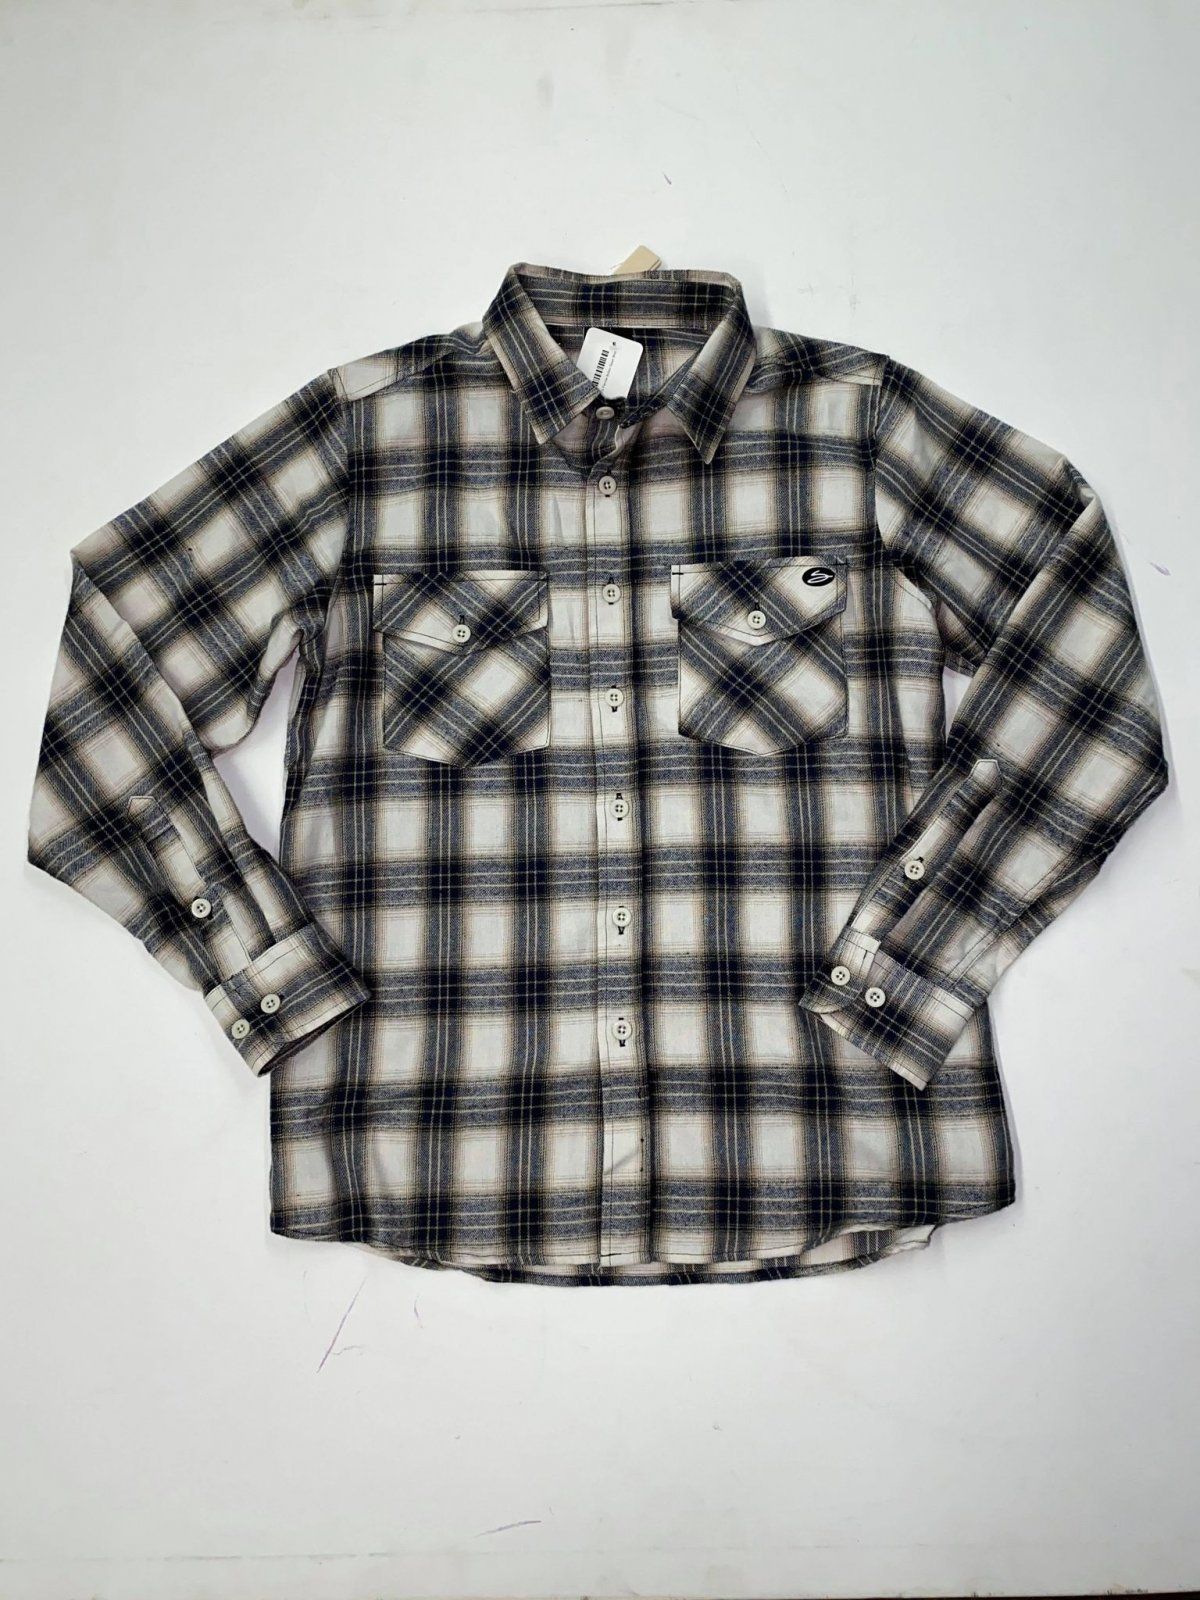 Salty's Brand Men's Flannel Button Down Shirt - Stone/Navy